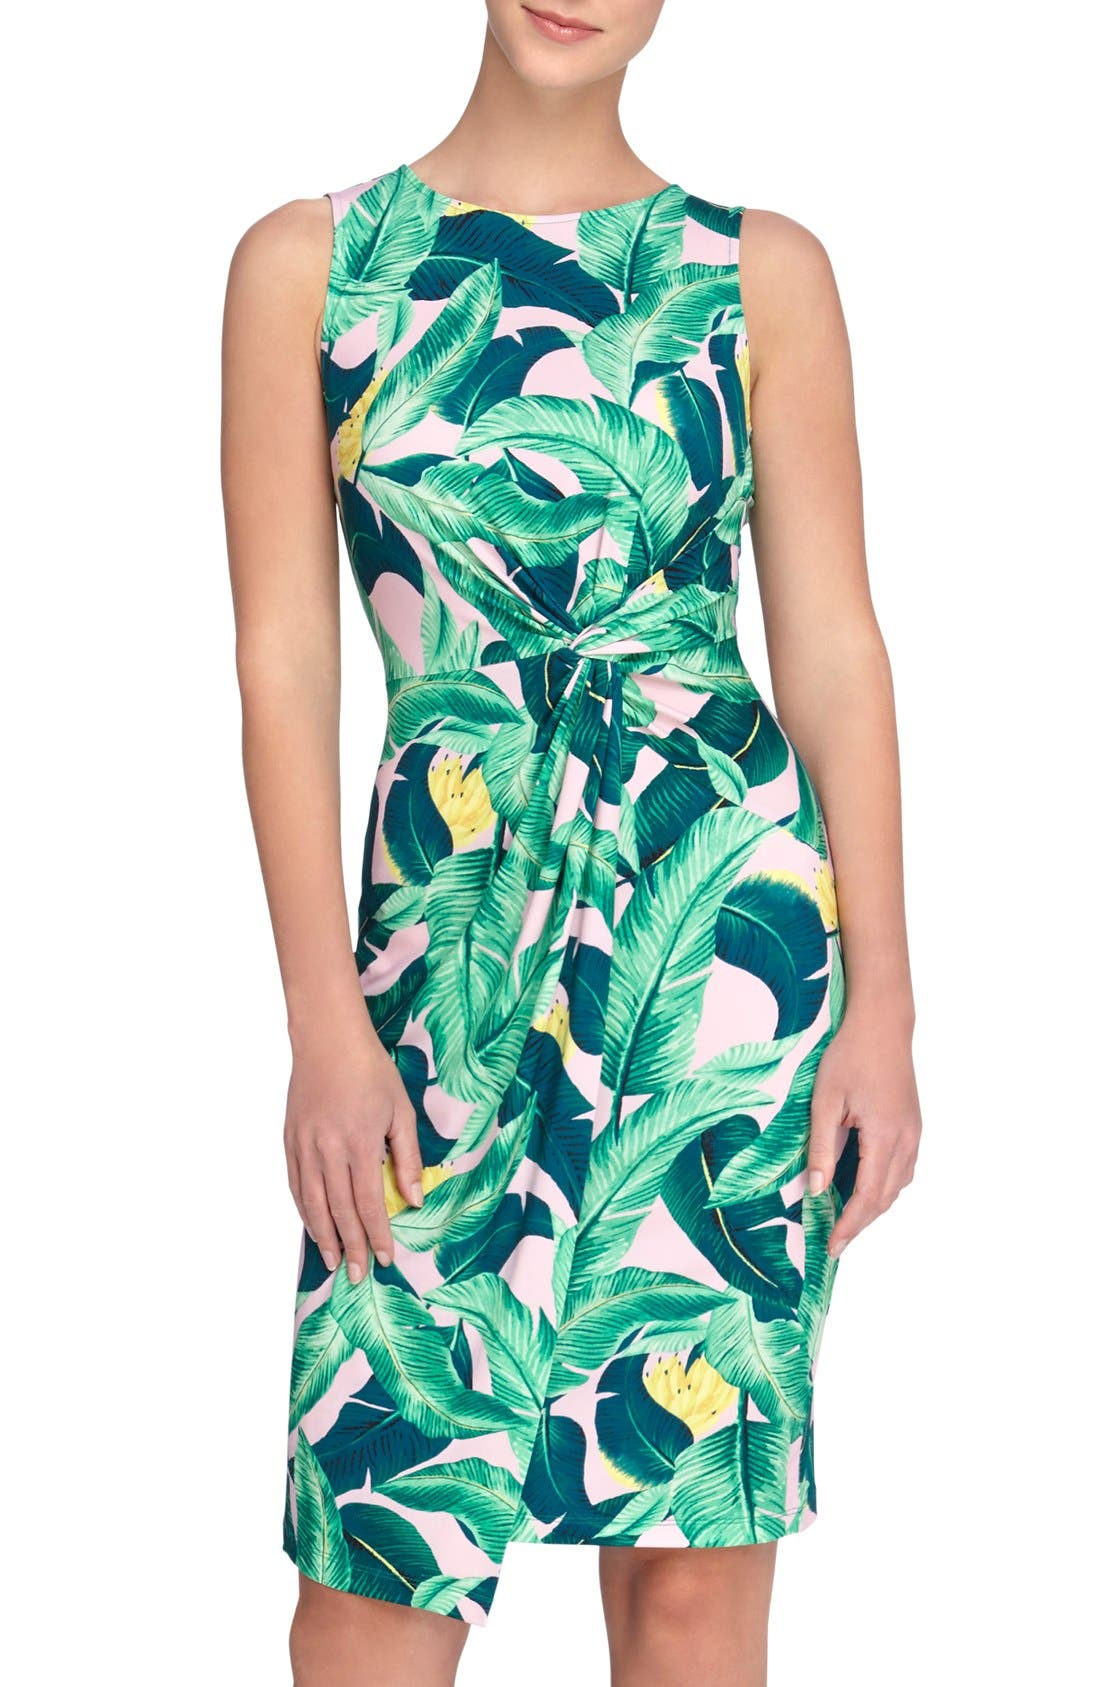 Alternate Image 1 Selected - Catherine Catherine Malandrino 'Adele' Tropical Print Sheath Dress